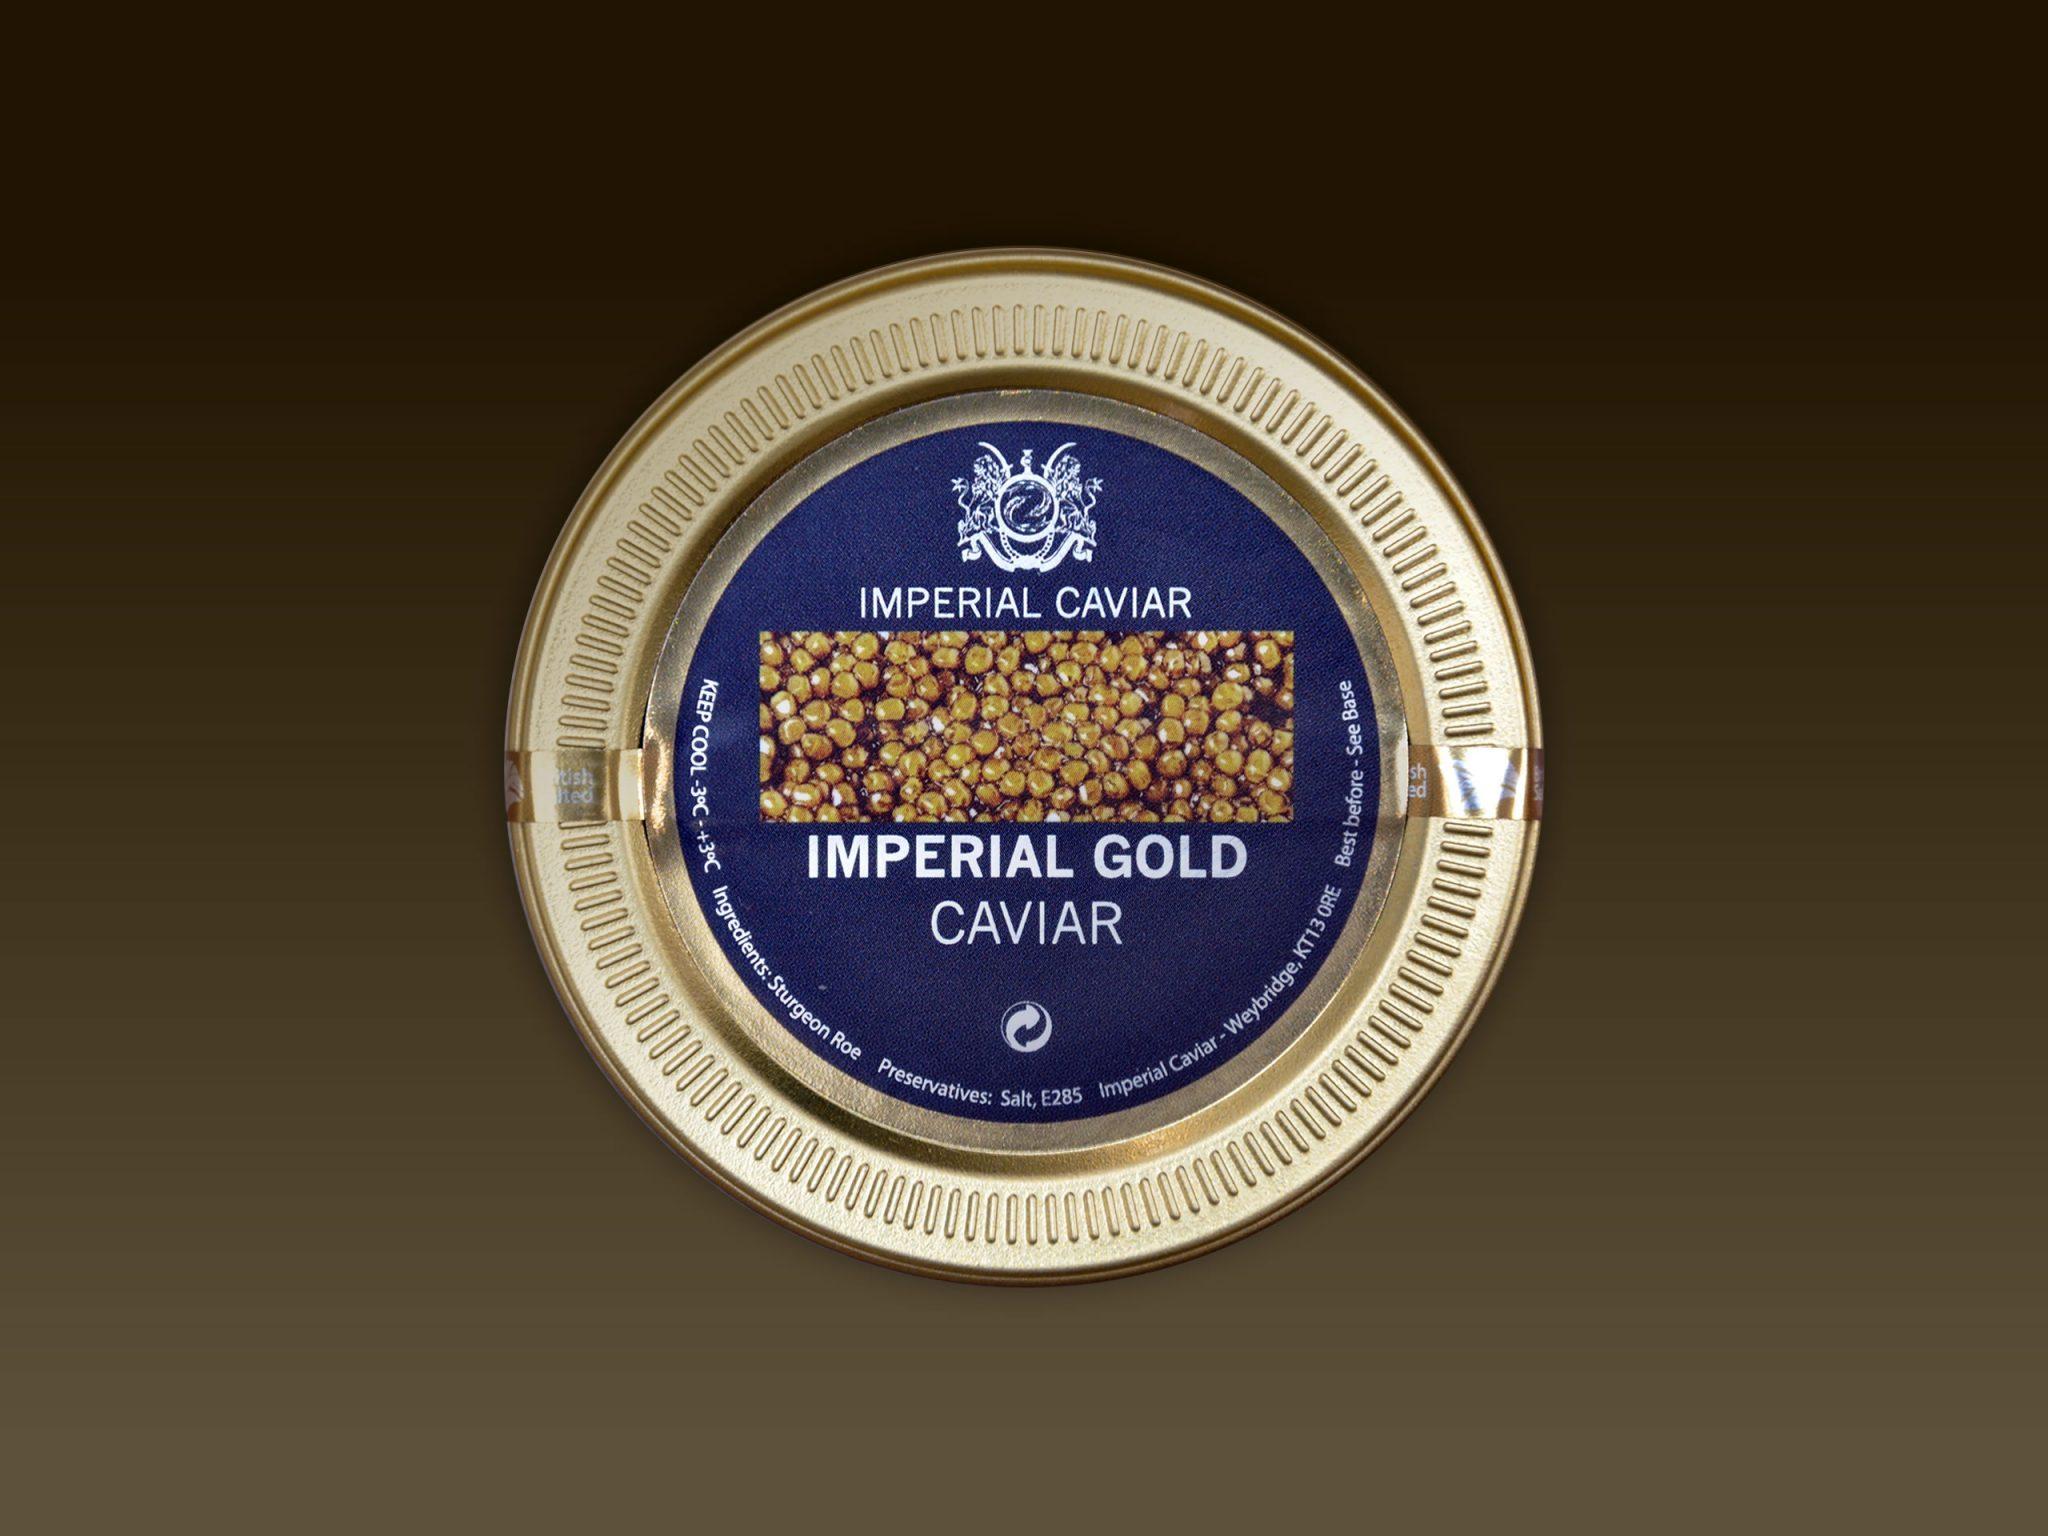 Imperial Gold Caviar